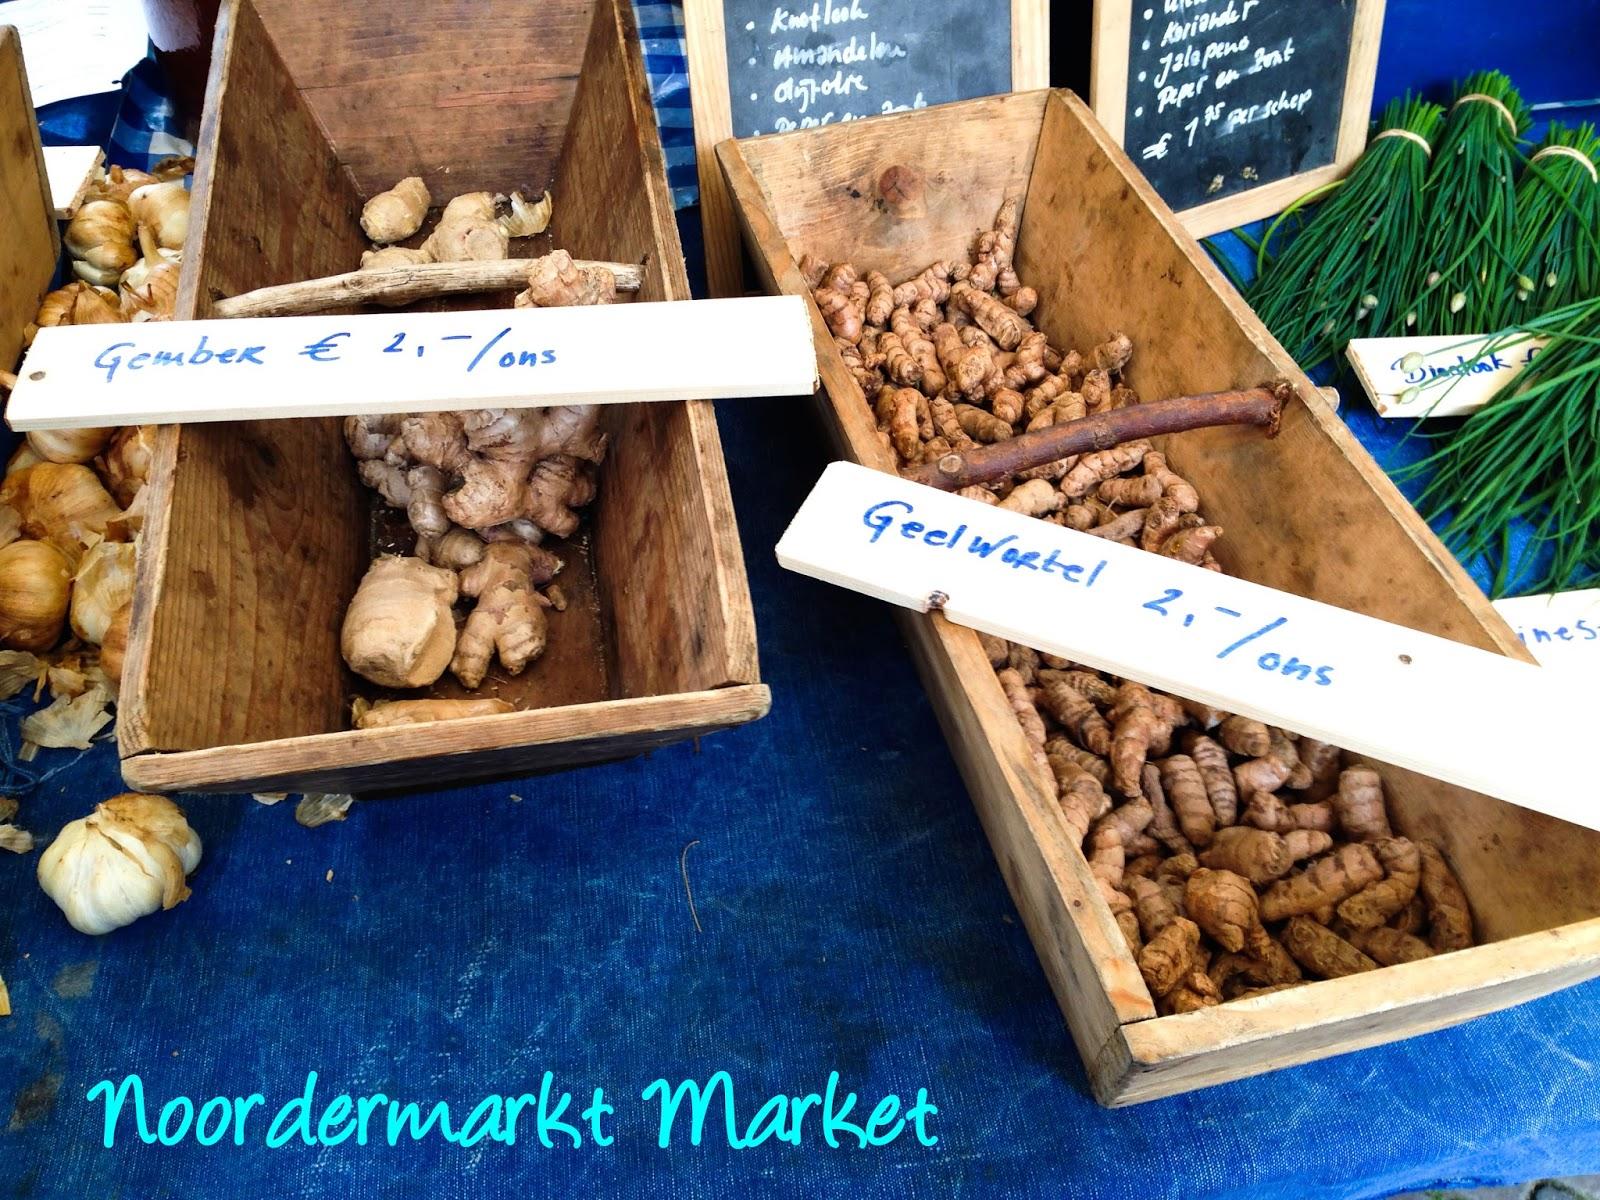 Amsterdam Noordermarkt Market Jordaan